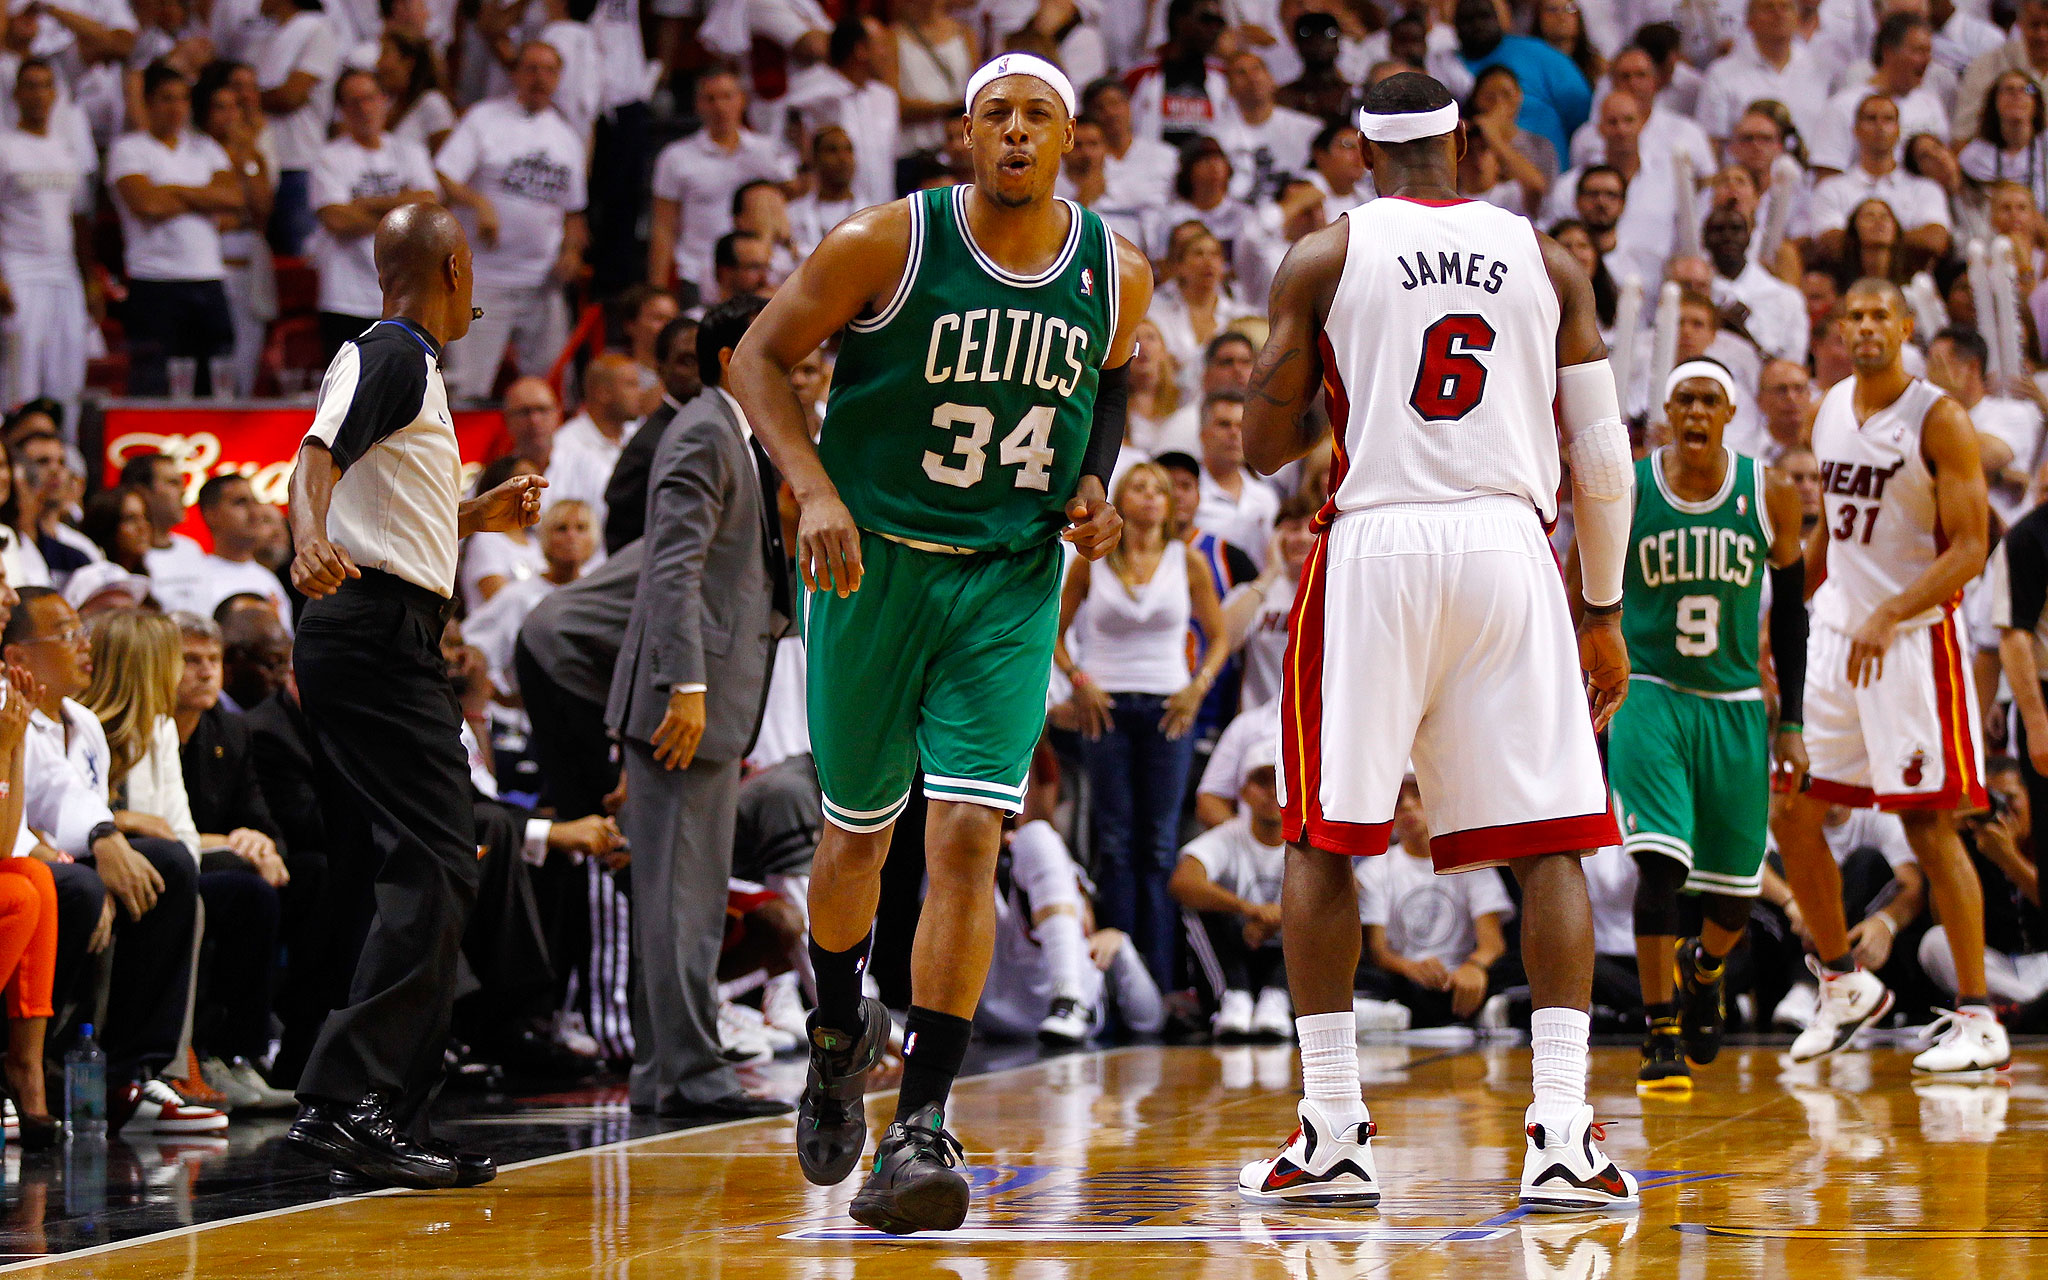 4. Celtics Go Up 3-2 On Heat